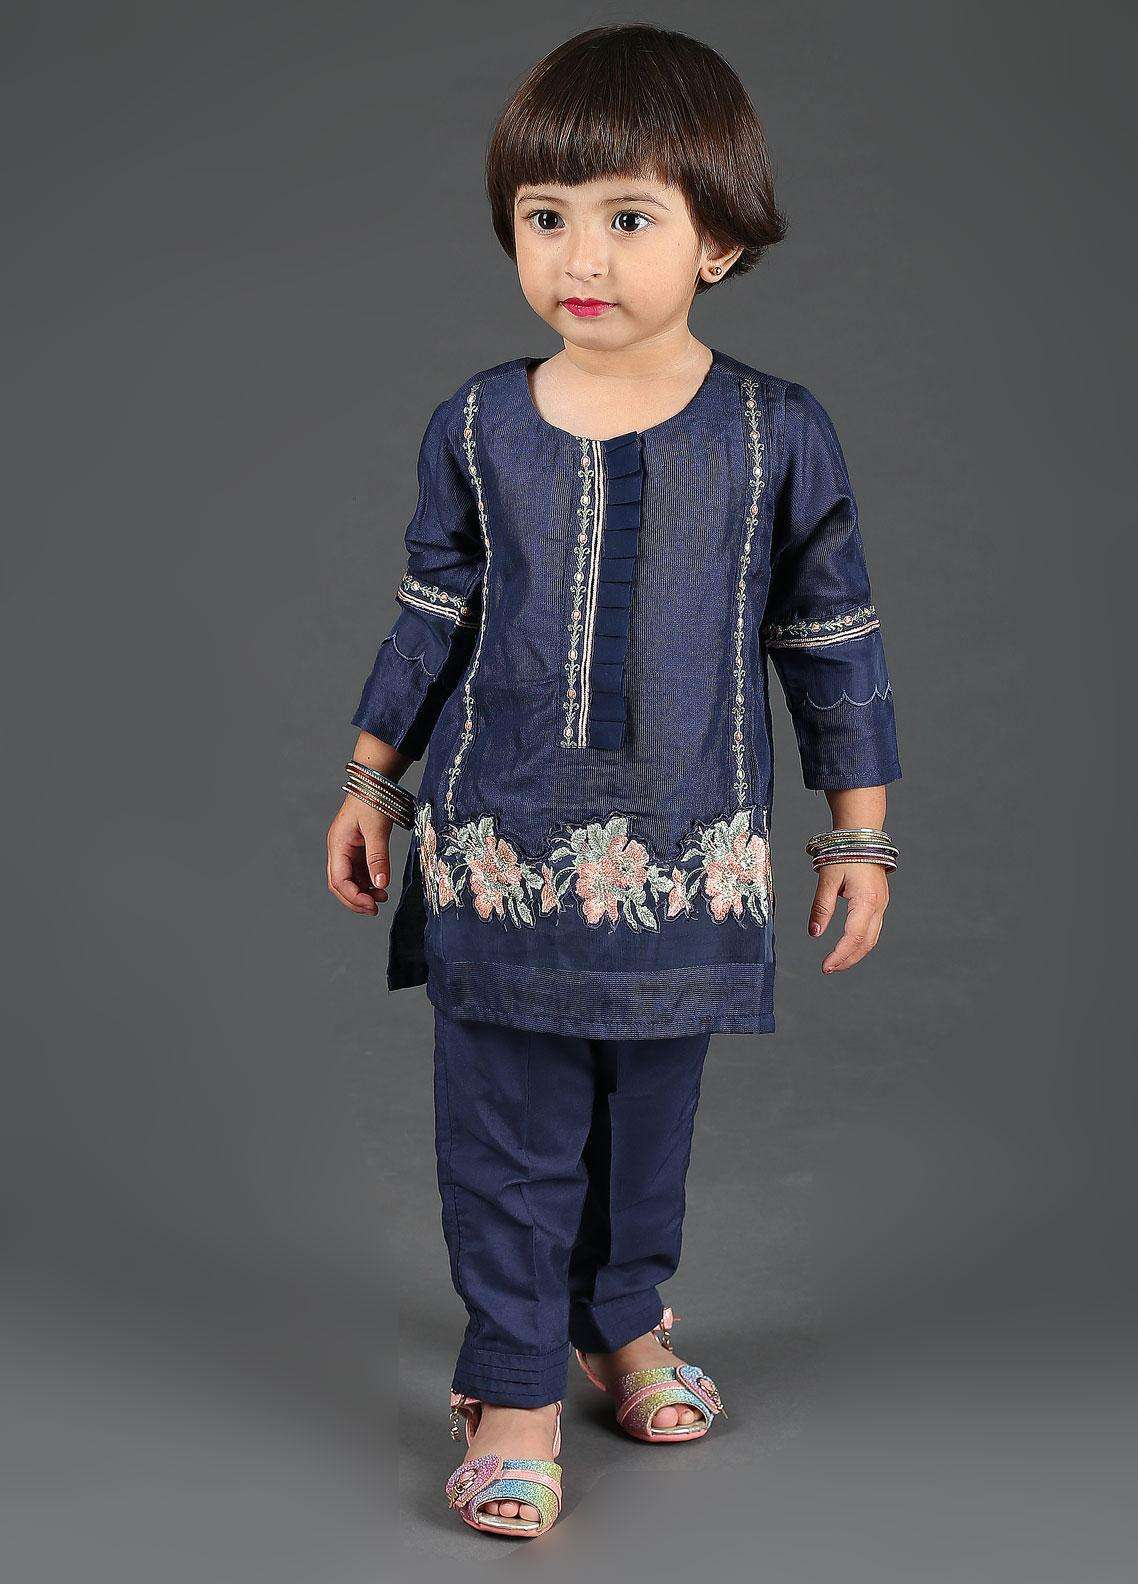 Dhanak Cotton Net Embroidered Girls 2 Piece Suits -  DK-0052 Navy Blue